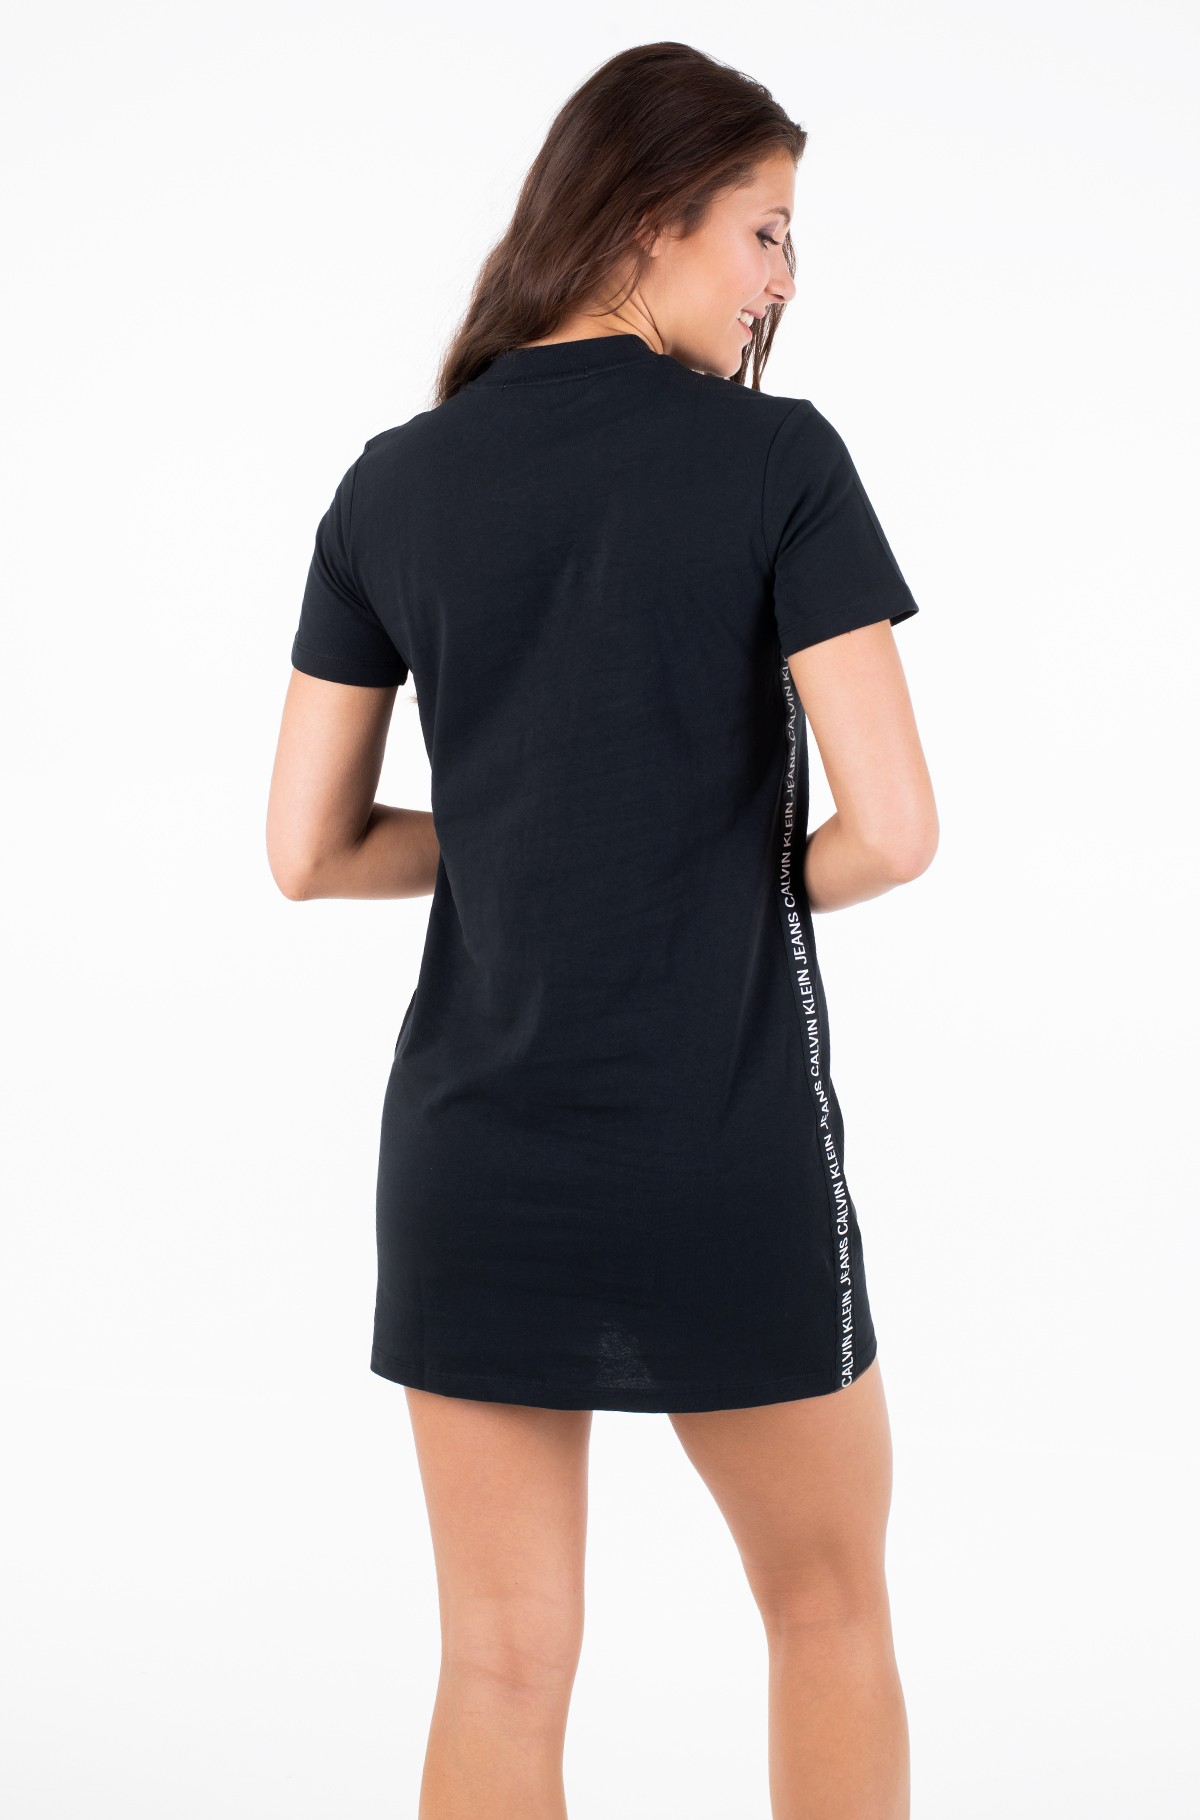 Suknelė TAPE LOGO T-SHIRT DRES-full-2